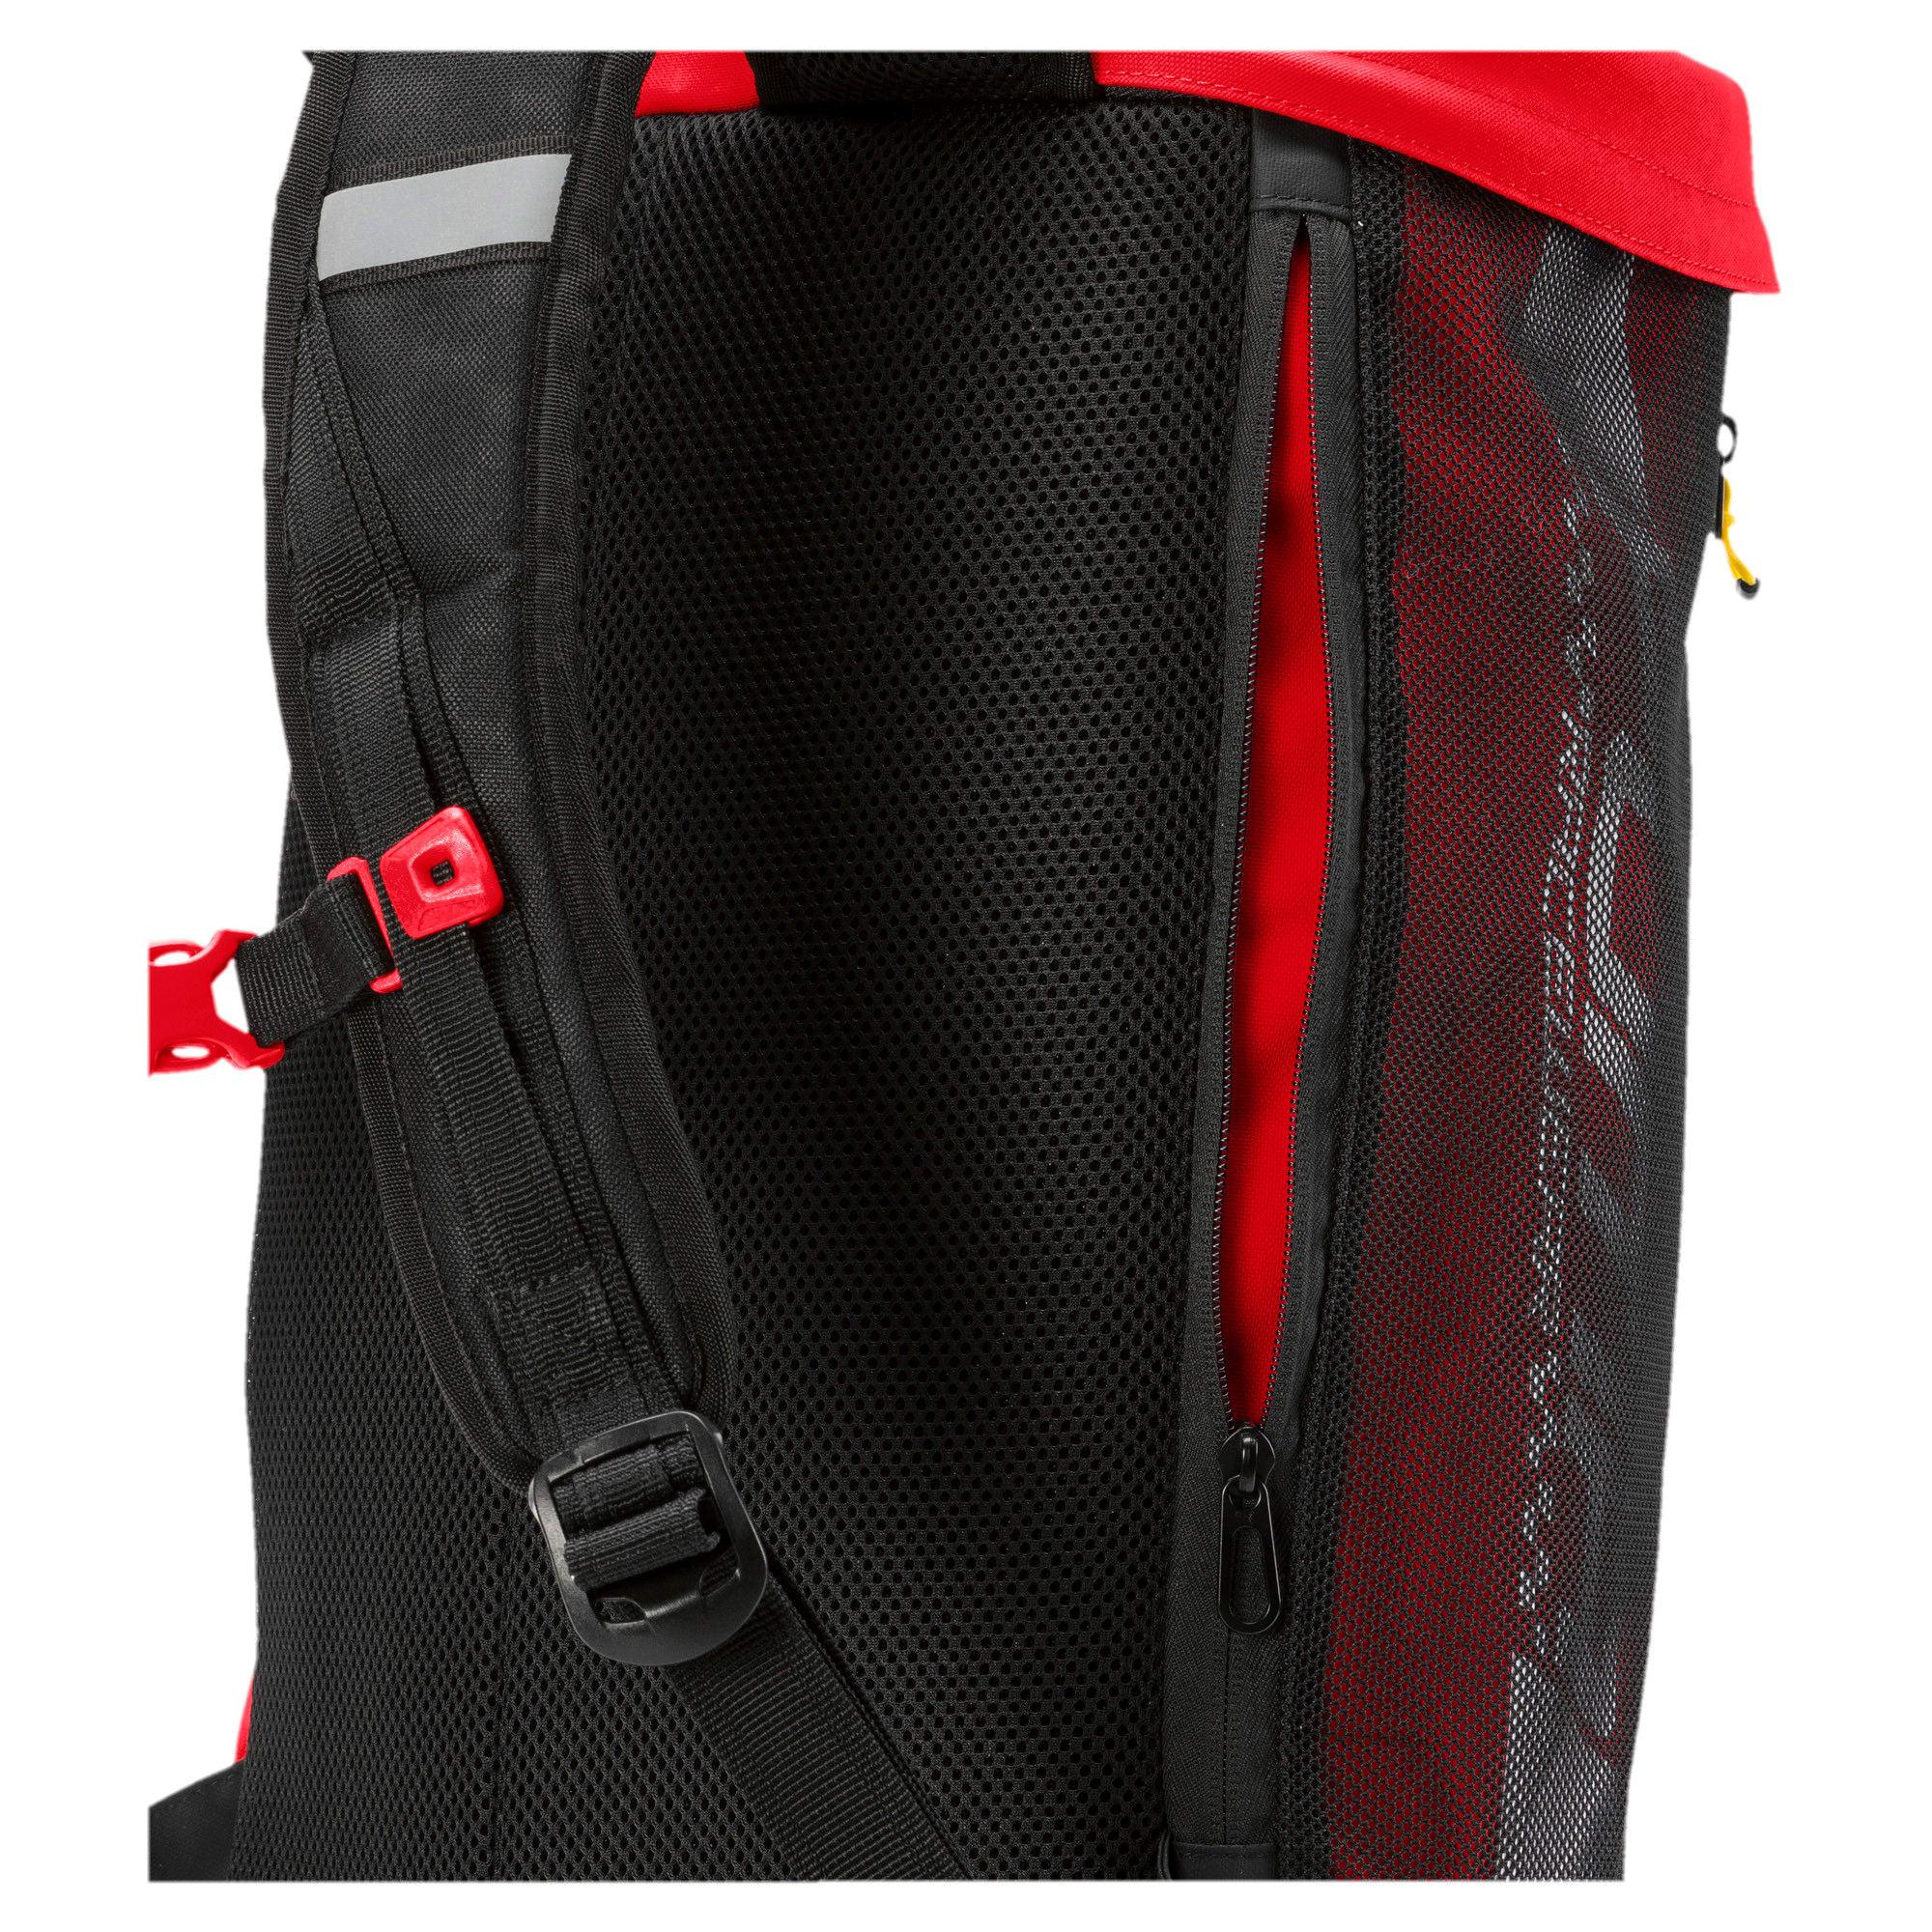 Thumbnail 3 of Scuderia Ferrari Fanwear RCT Backpack, Rosso Corsa, medium